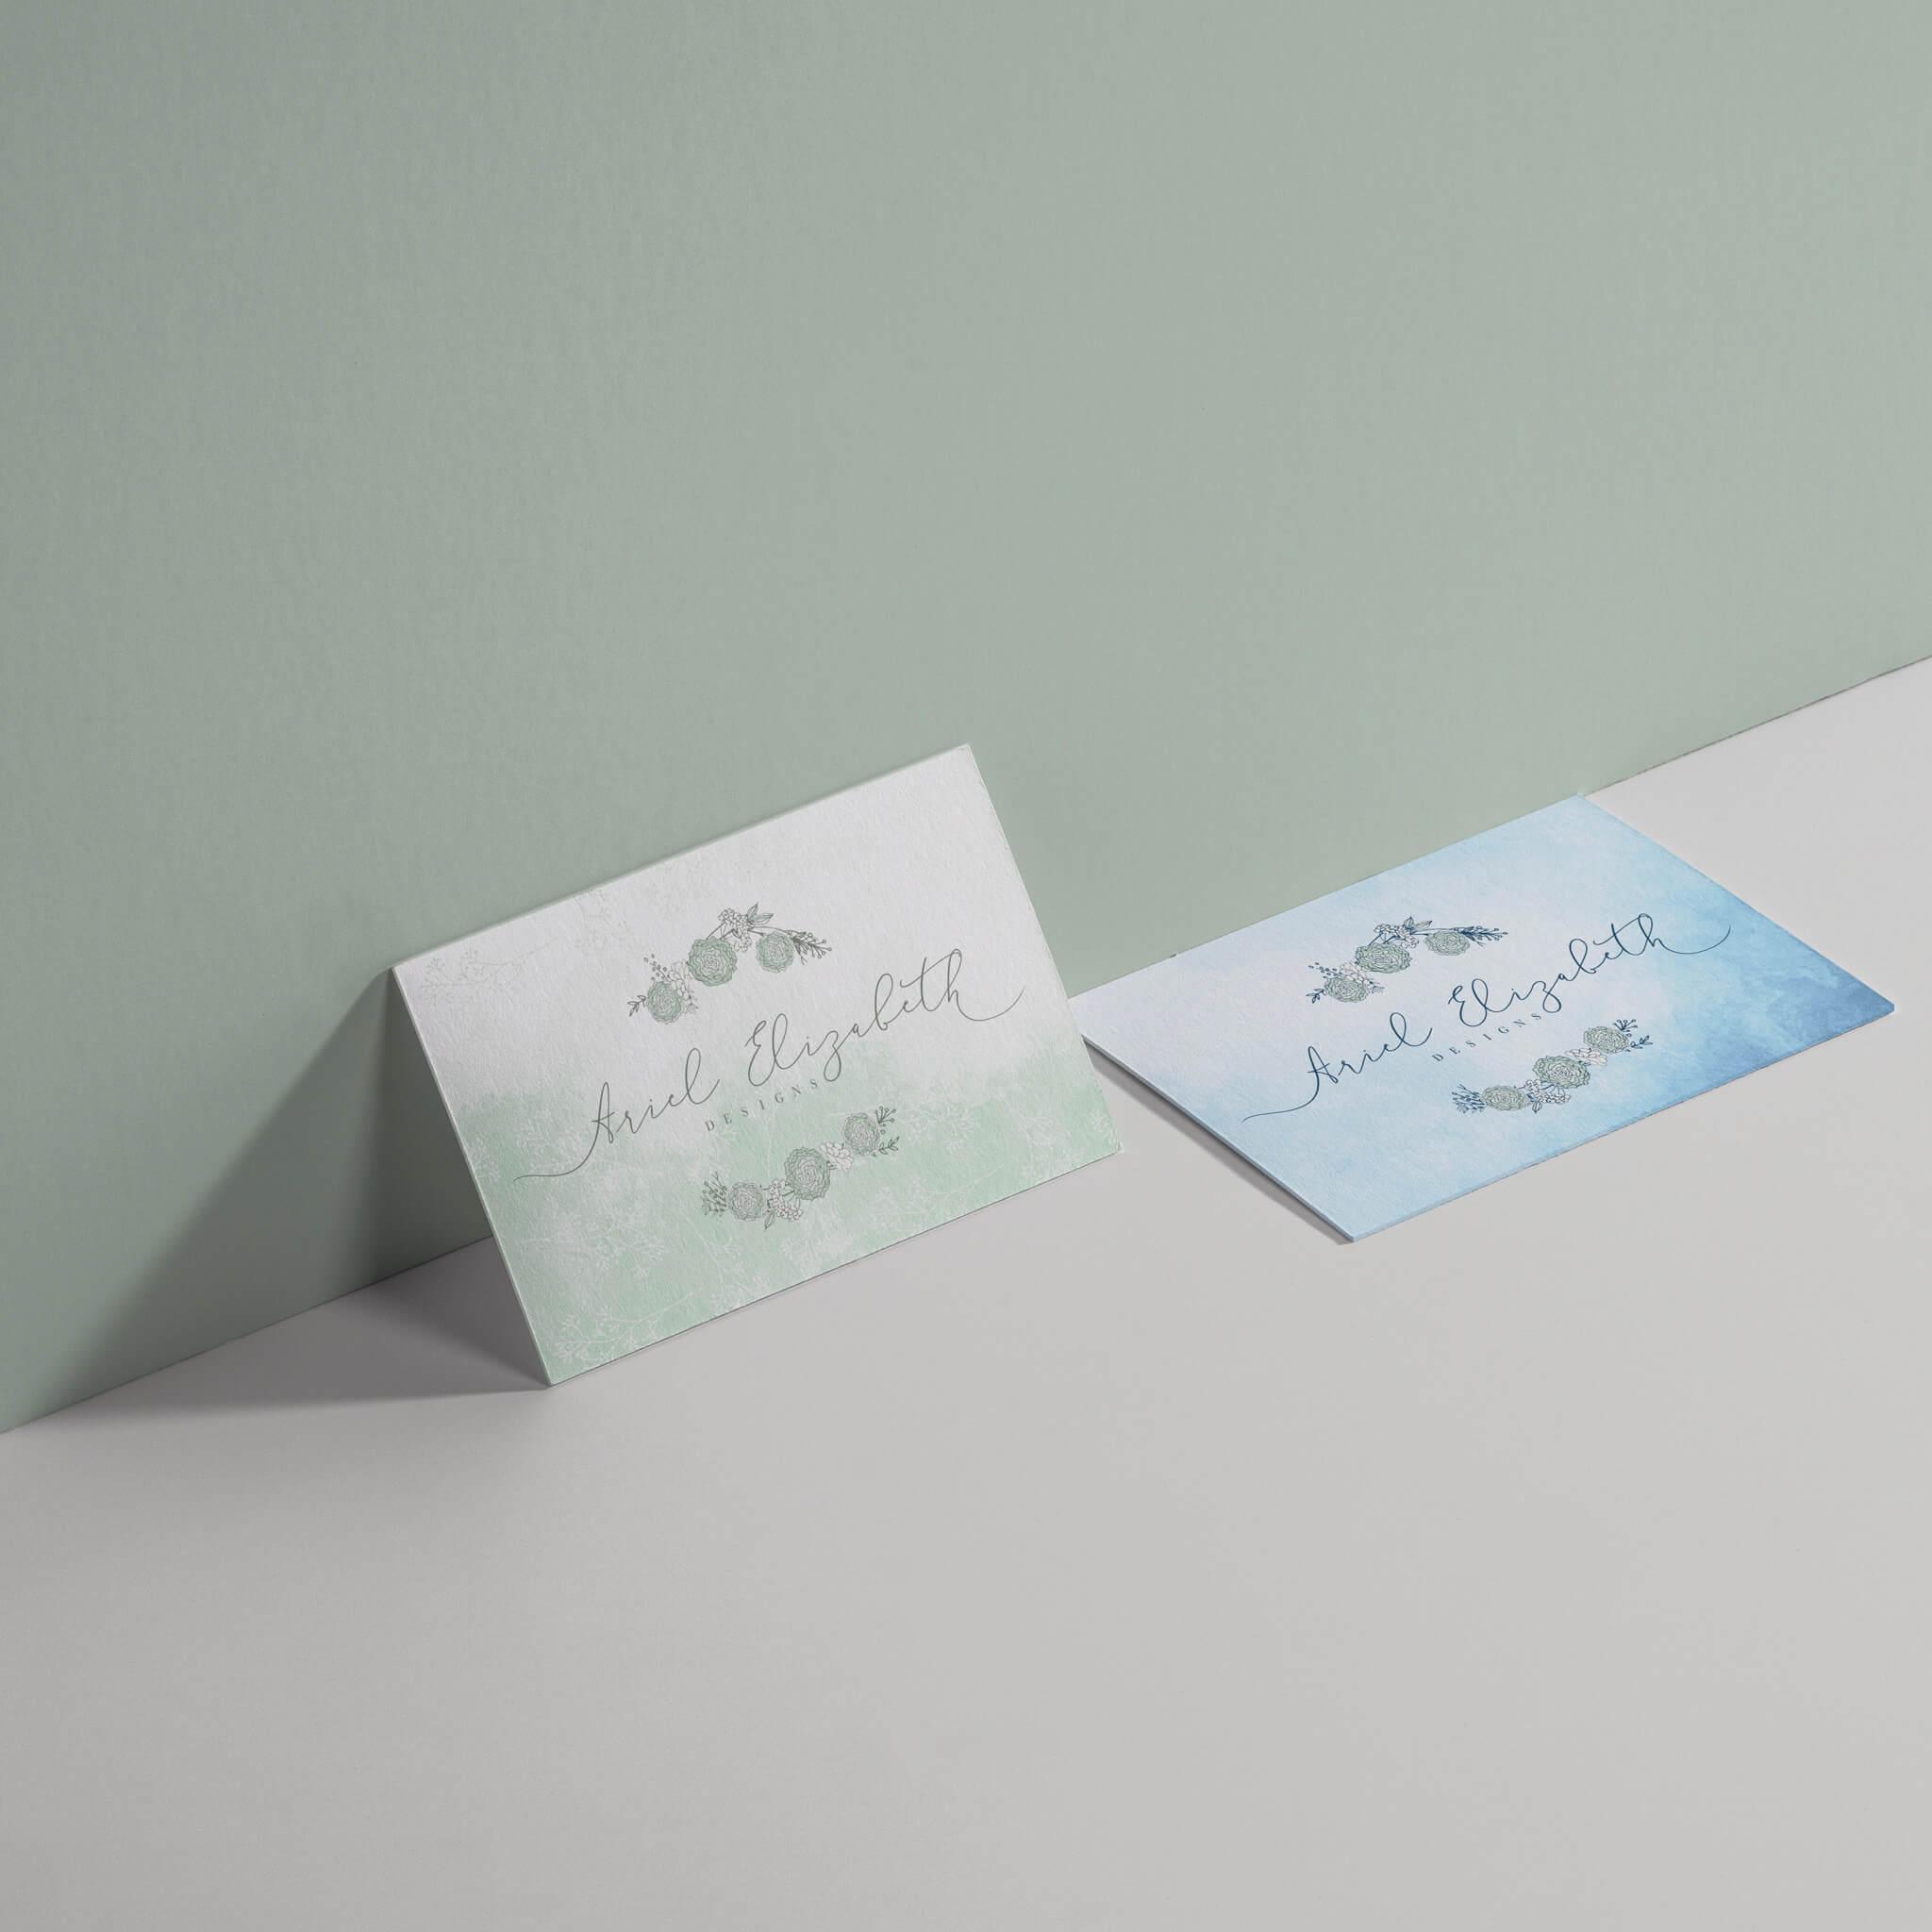 Original business card design for Ariel Elizabeth Designs